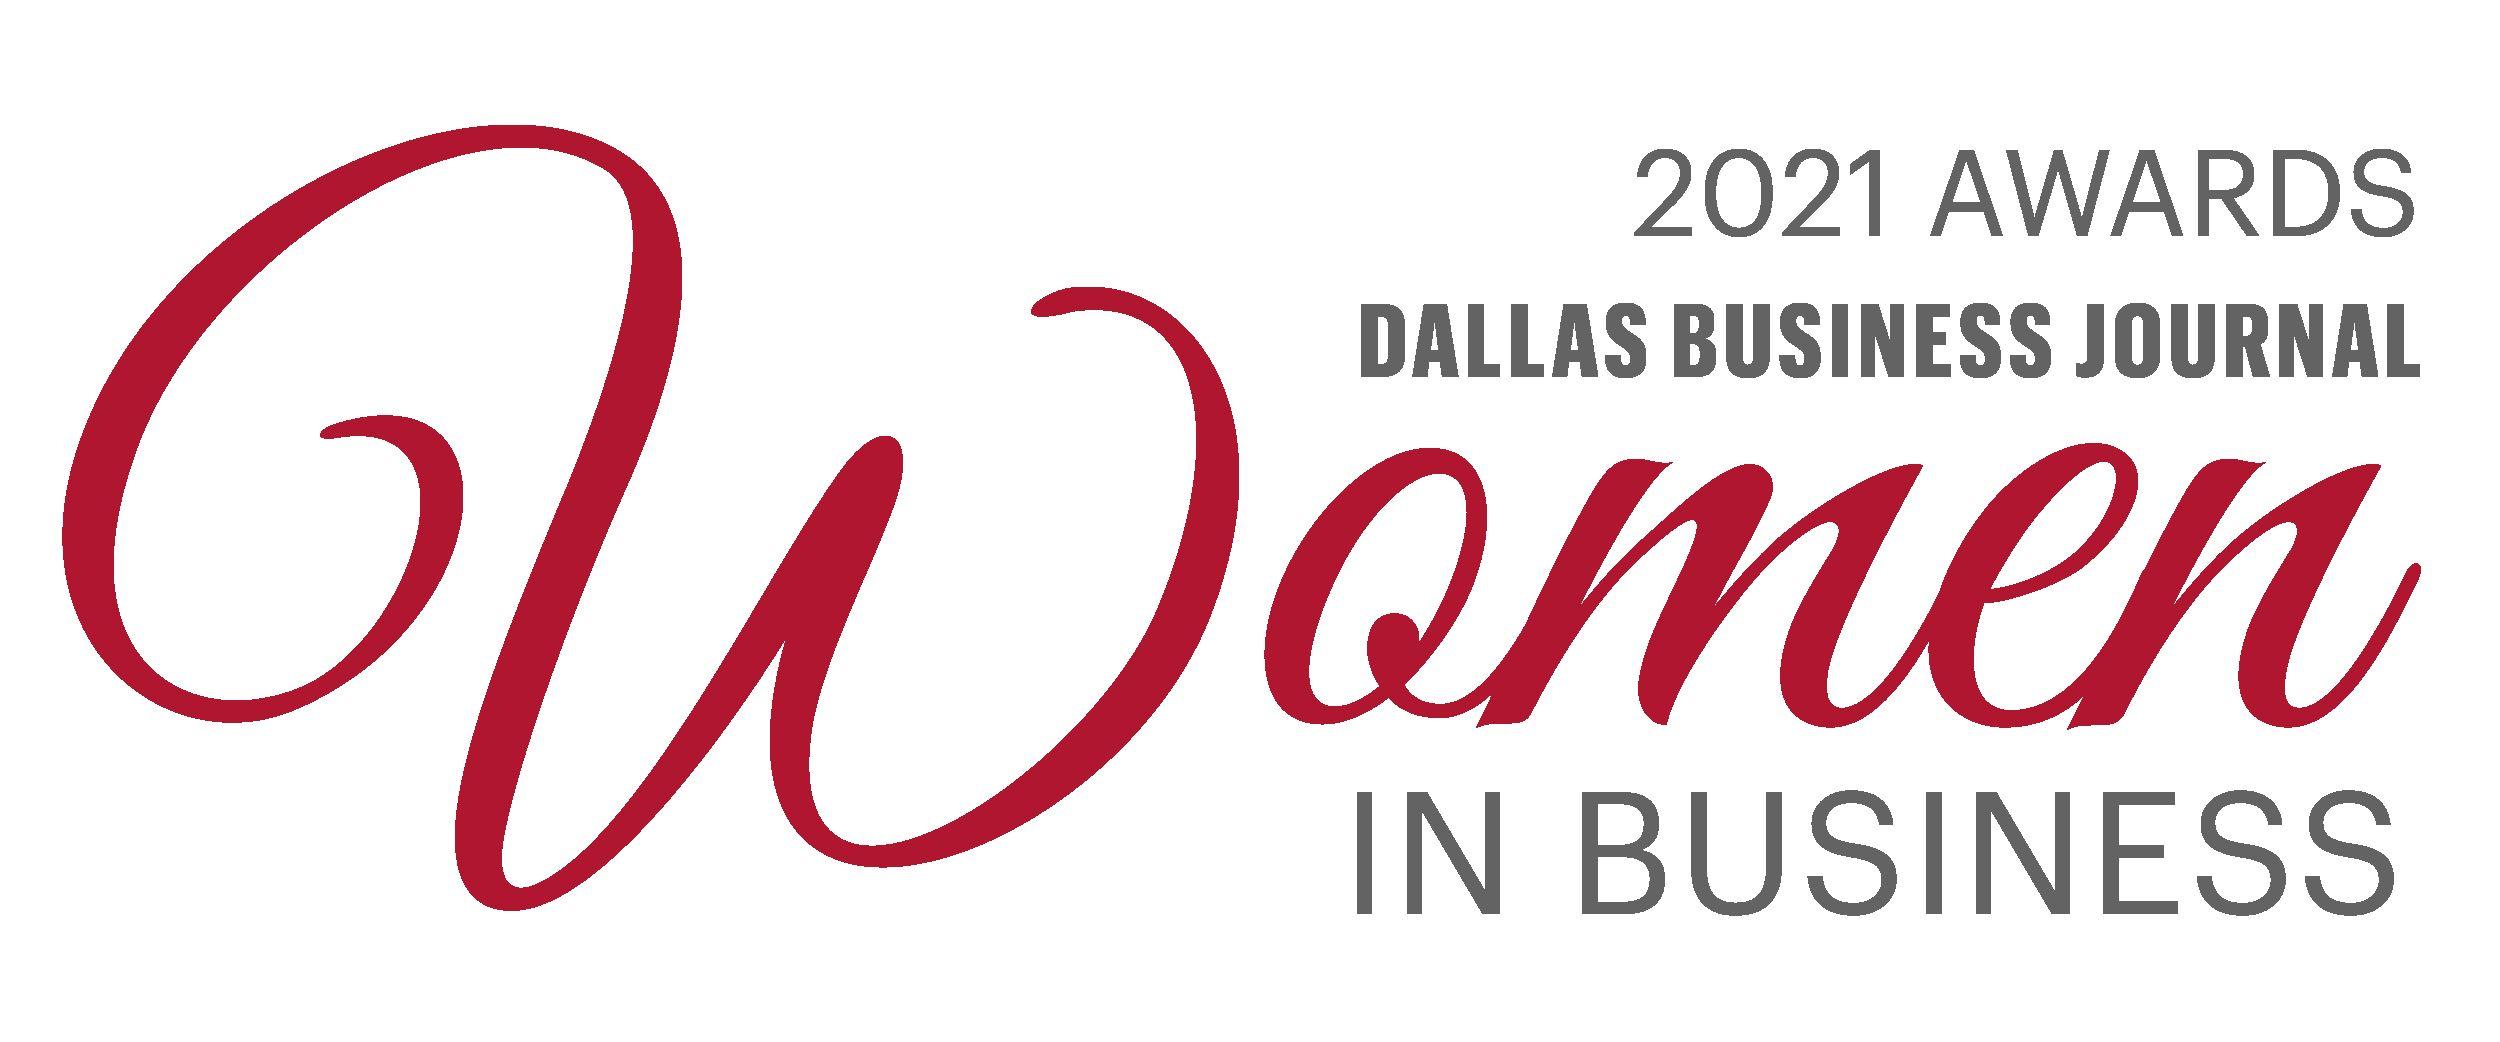 Dallas Business Journal, Women in Business Awards